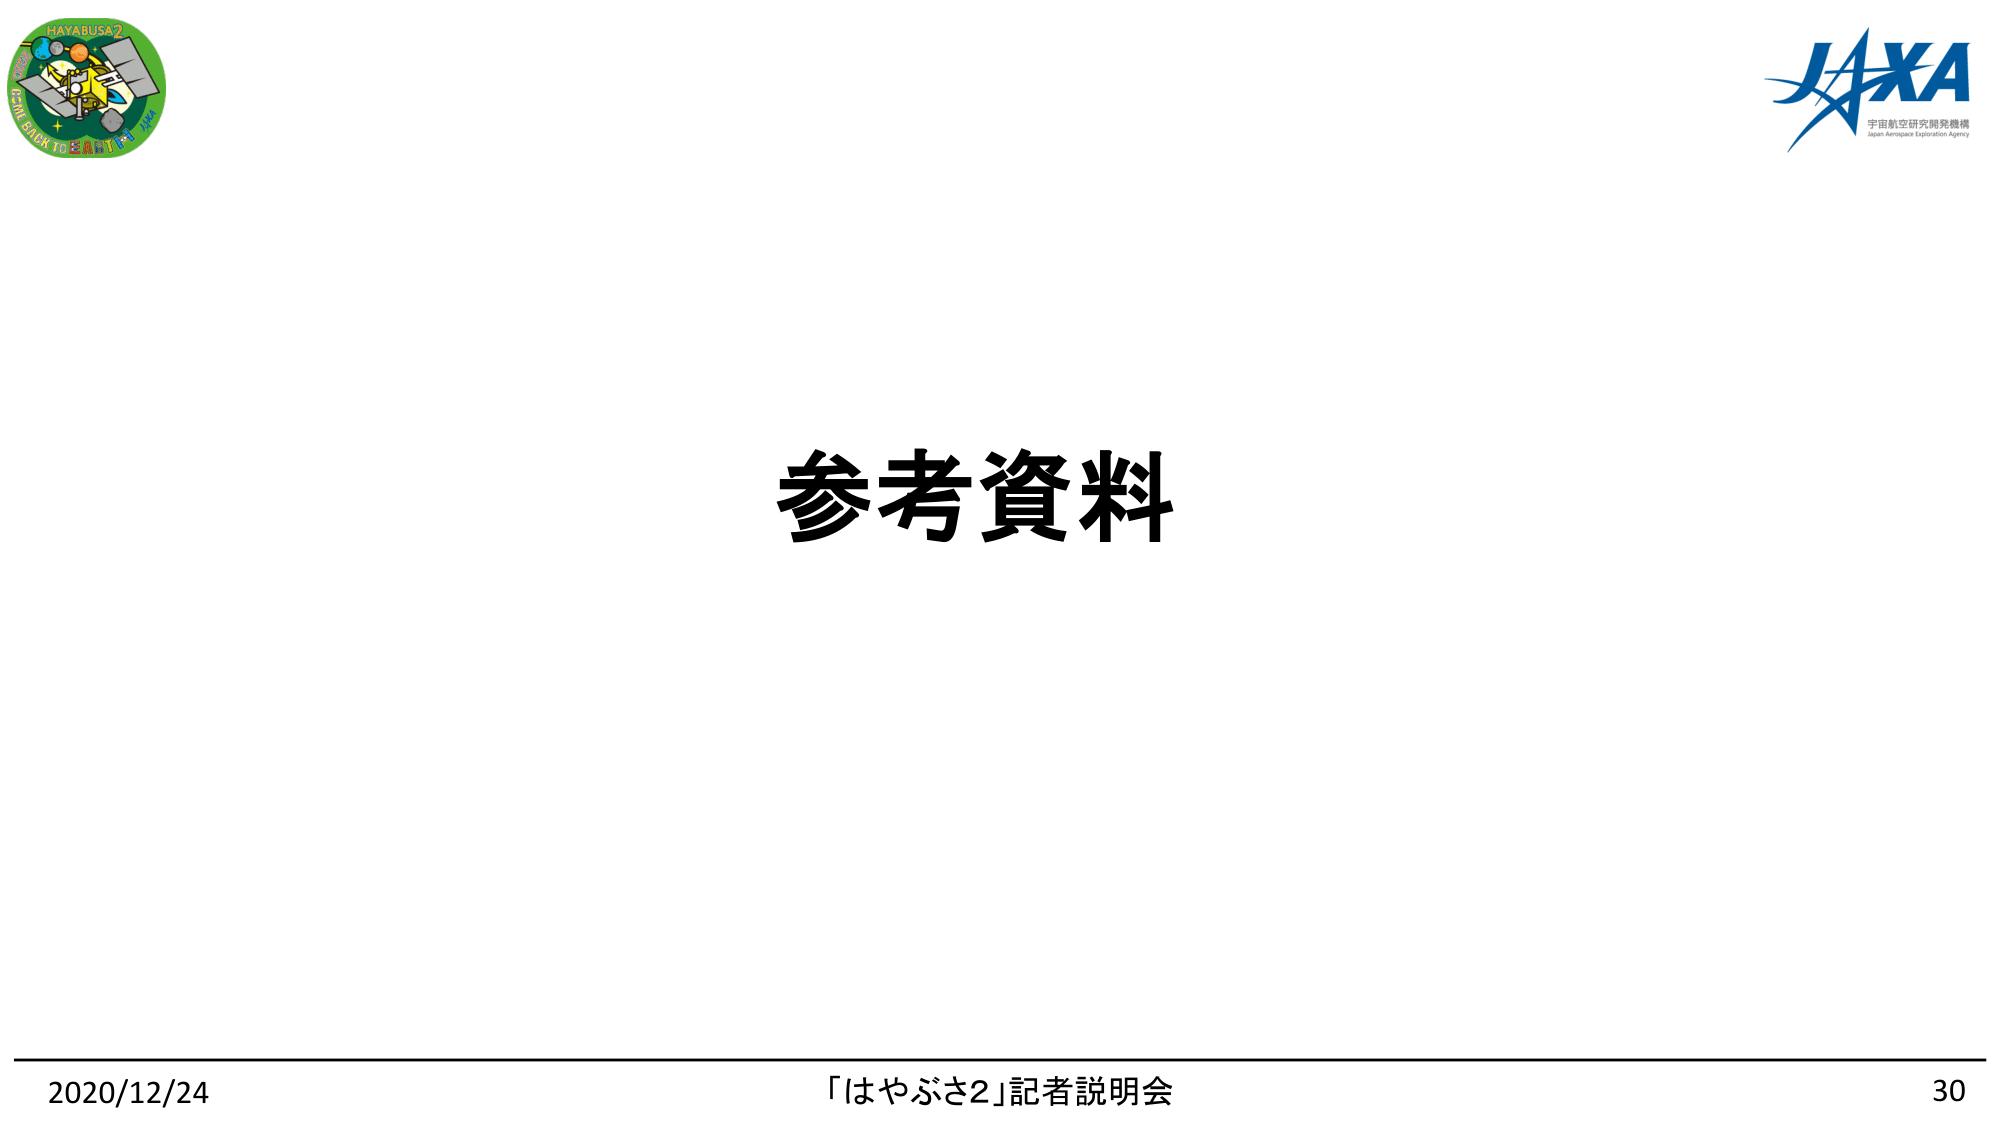 f:id:Imamura:20201224135327p:plain